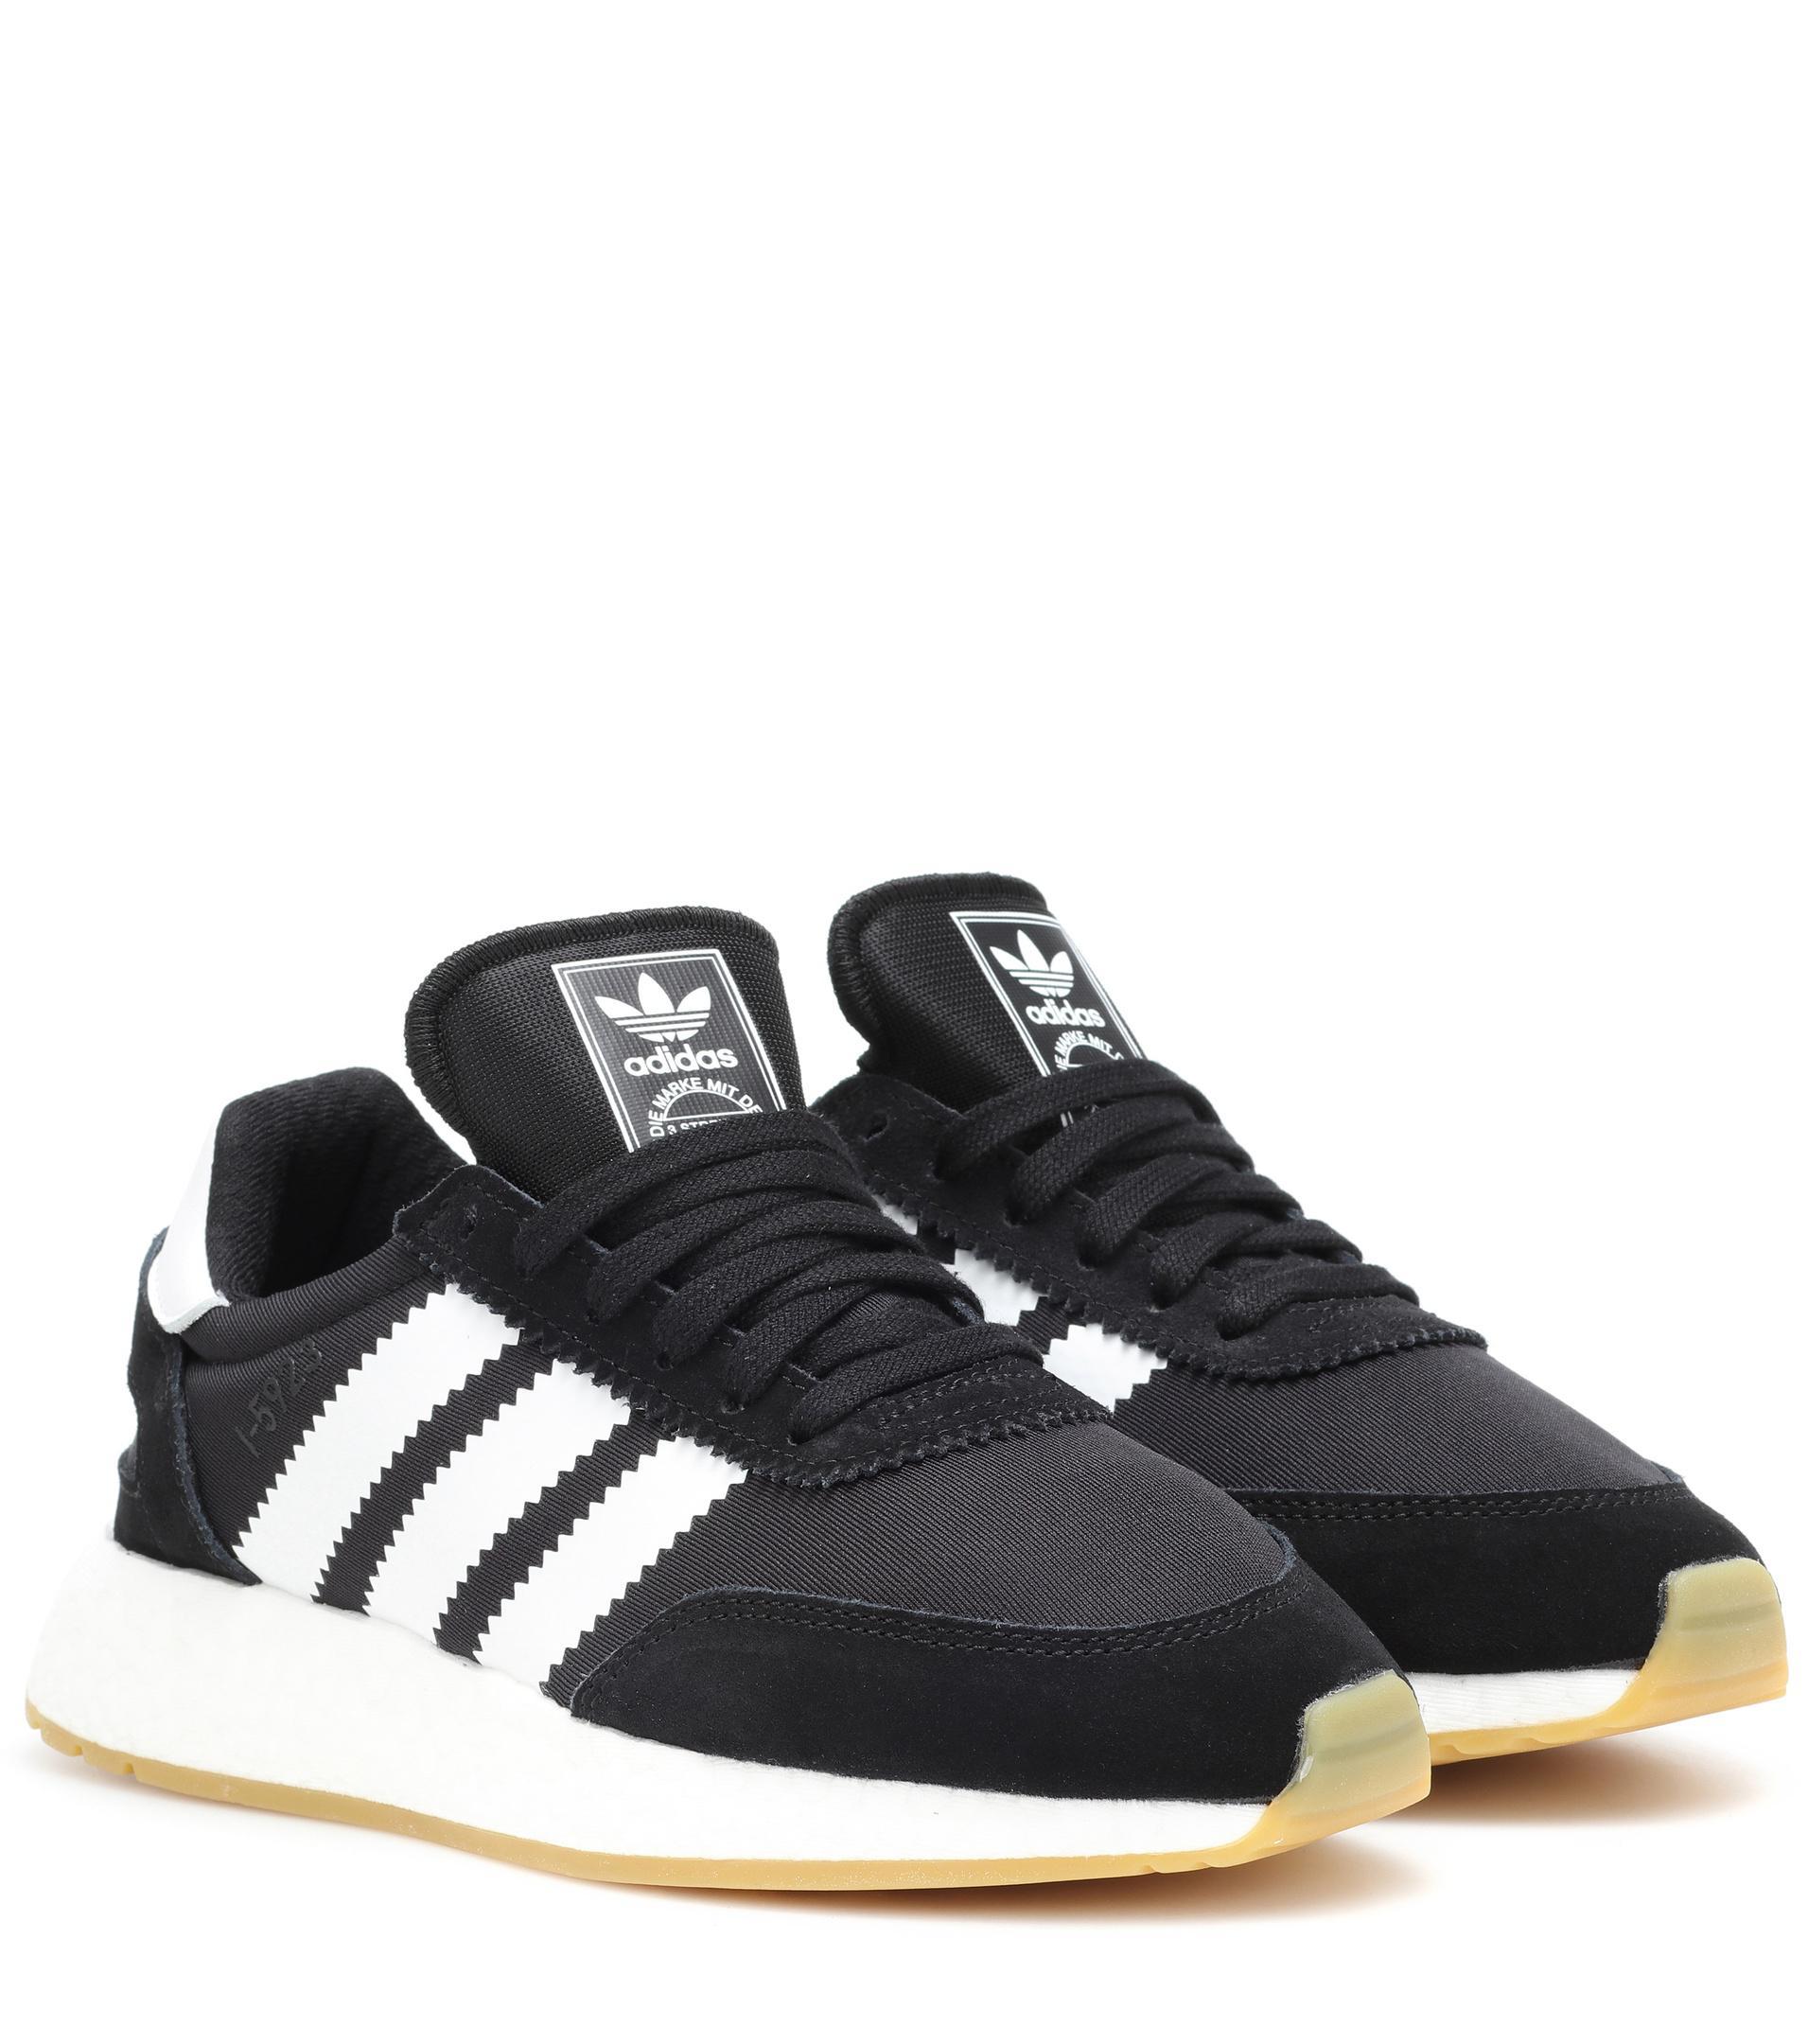 adidas Originals. Damen Sneakers Runner Pride mit Veloursleder in schwarz 9f116ebe51